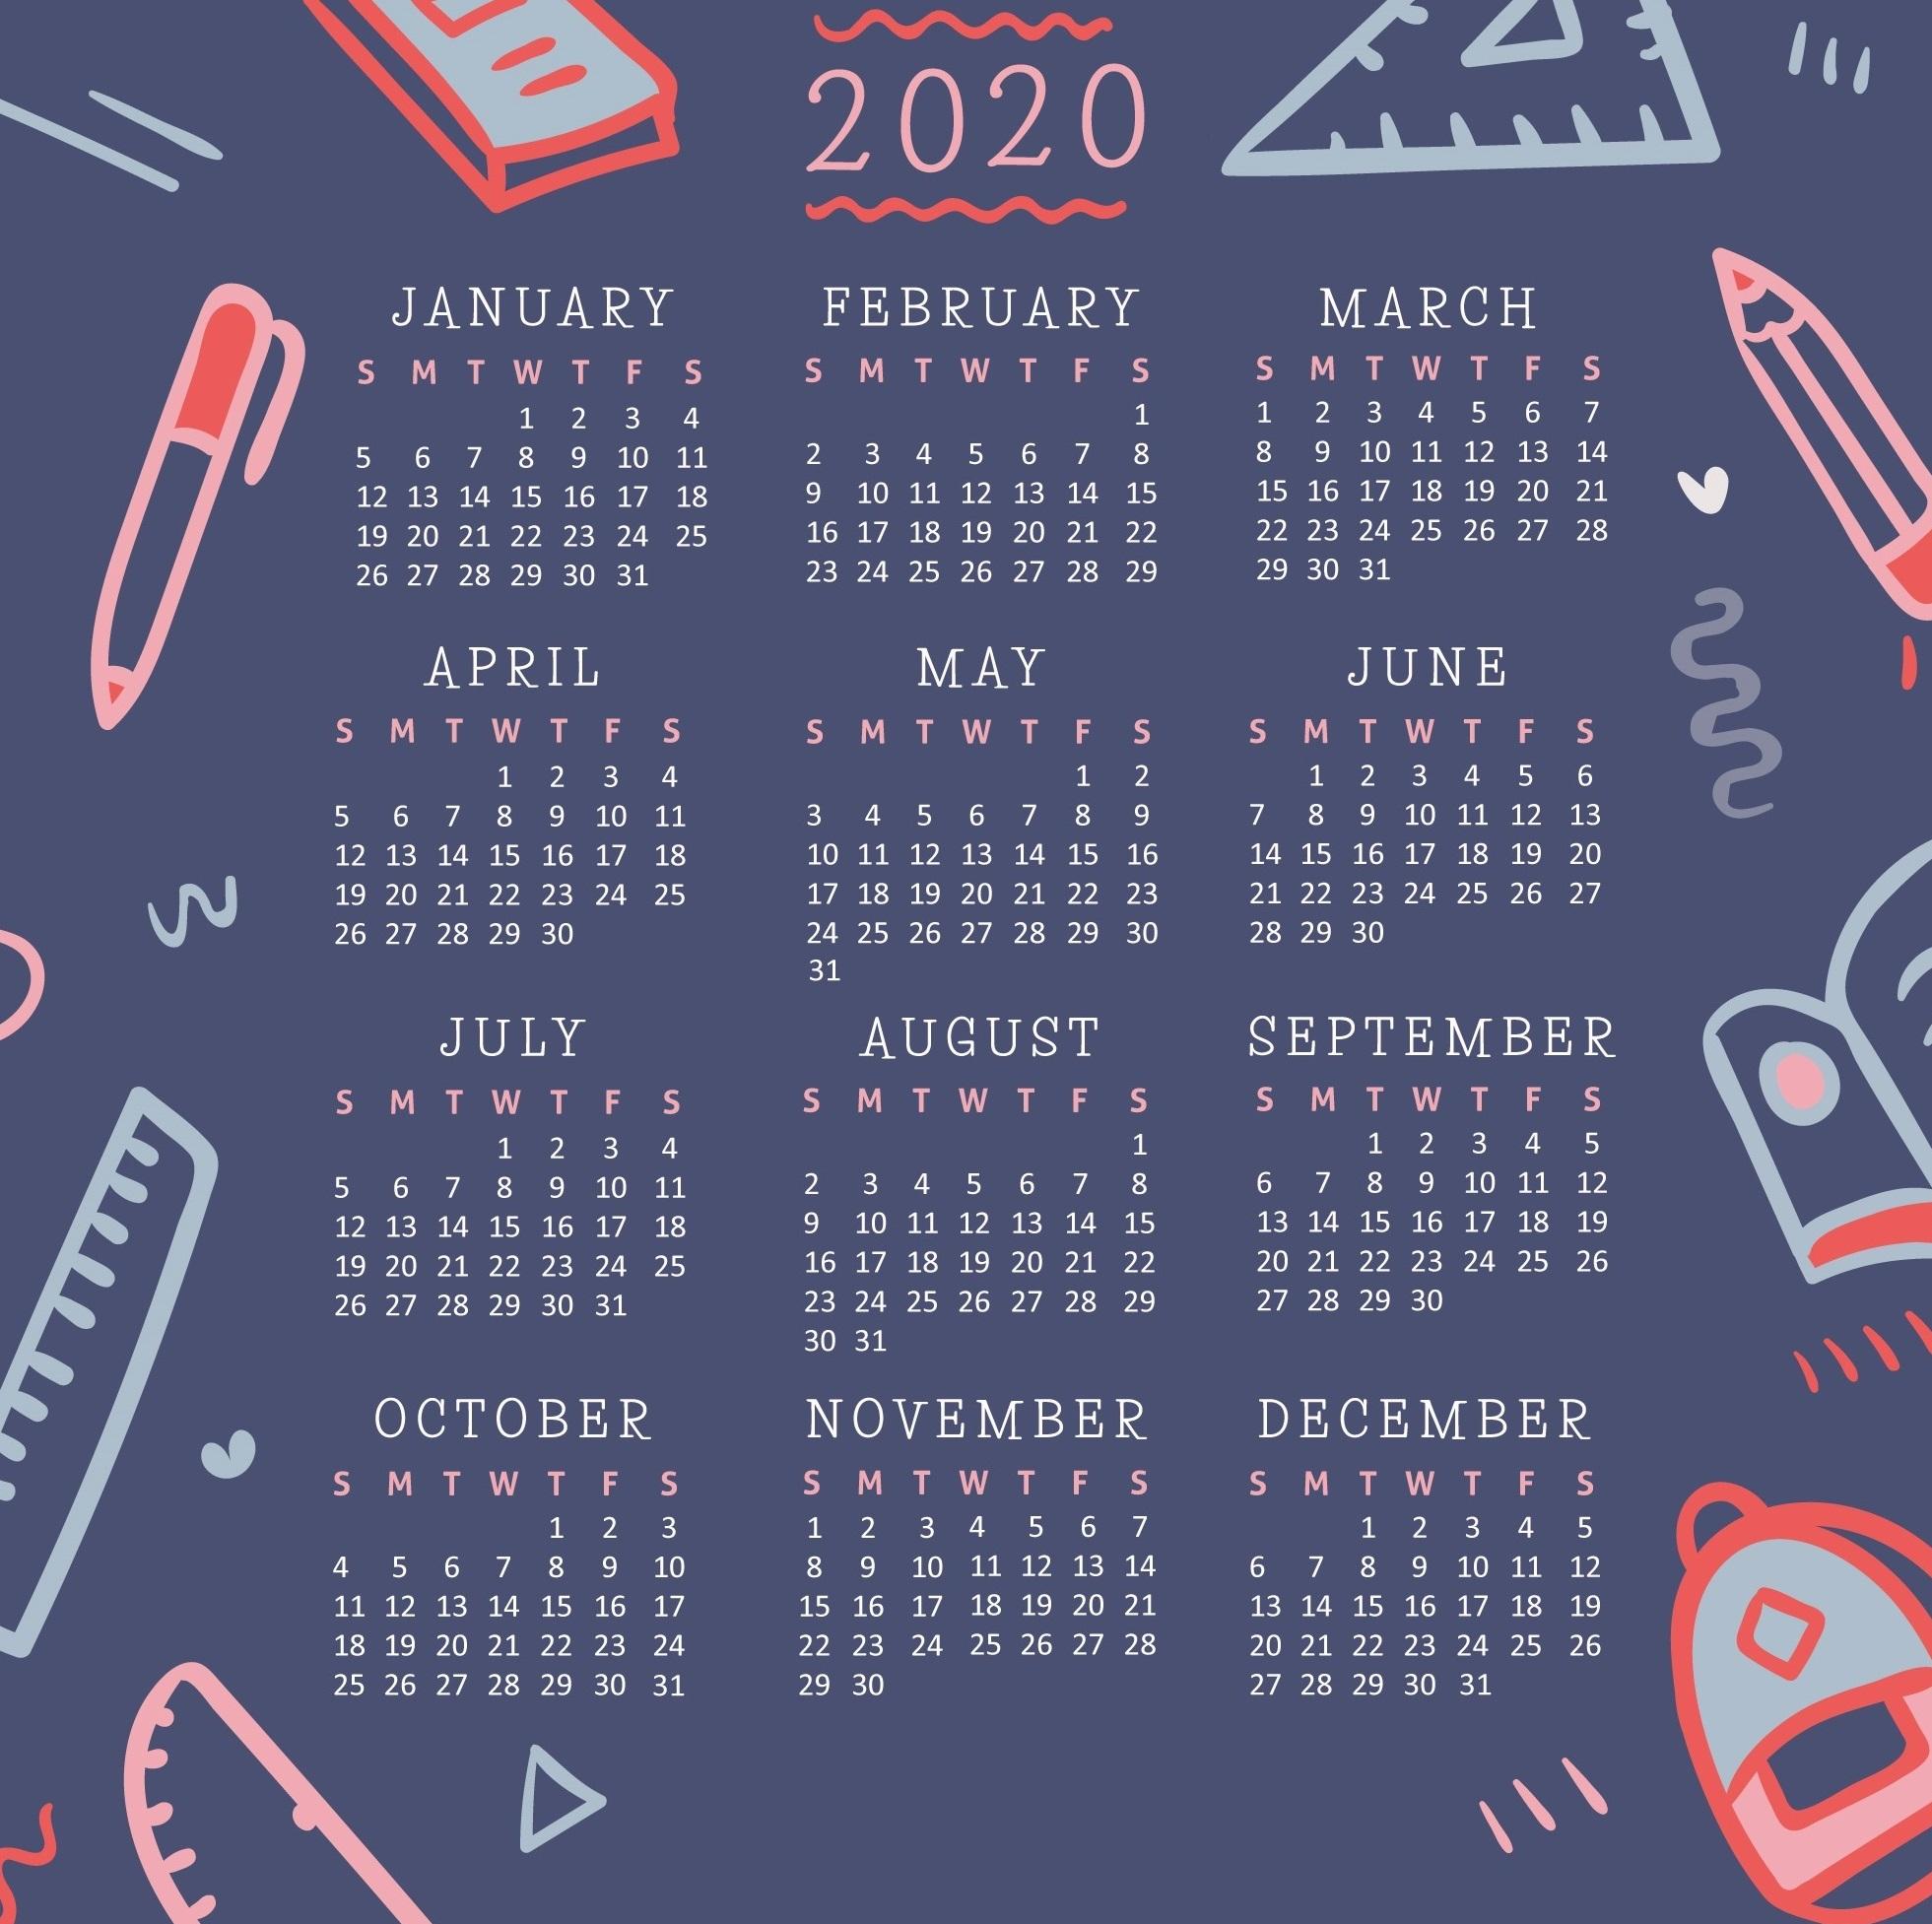 Desktop 2020 Calendar Wallpaper Max Calendars 1961x1953